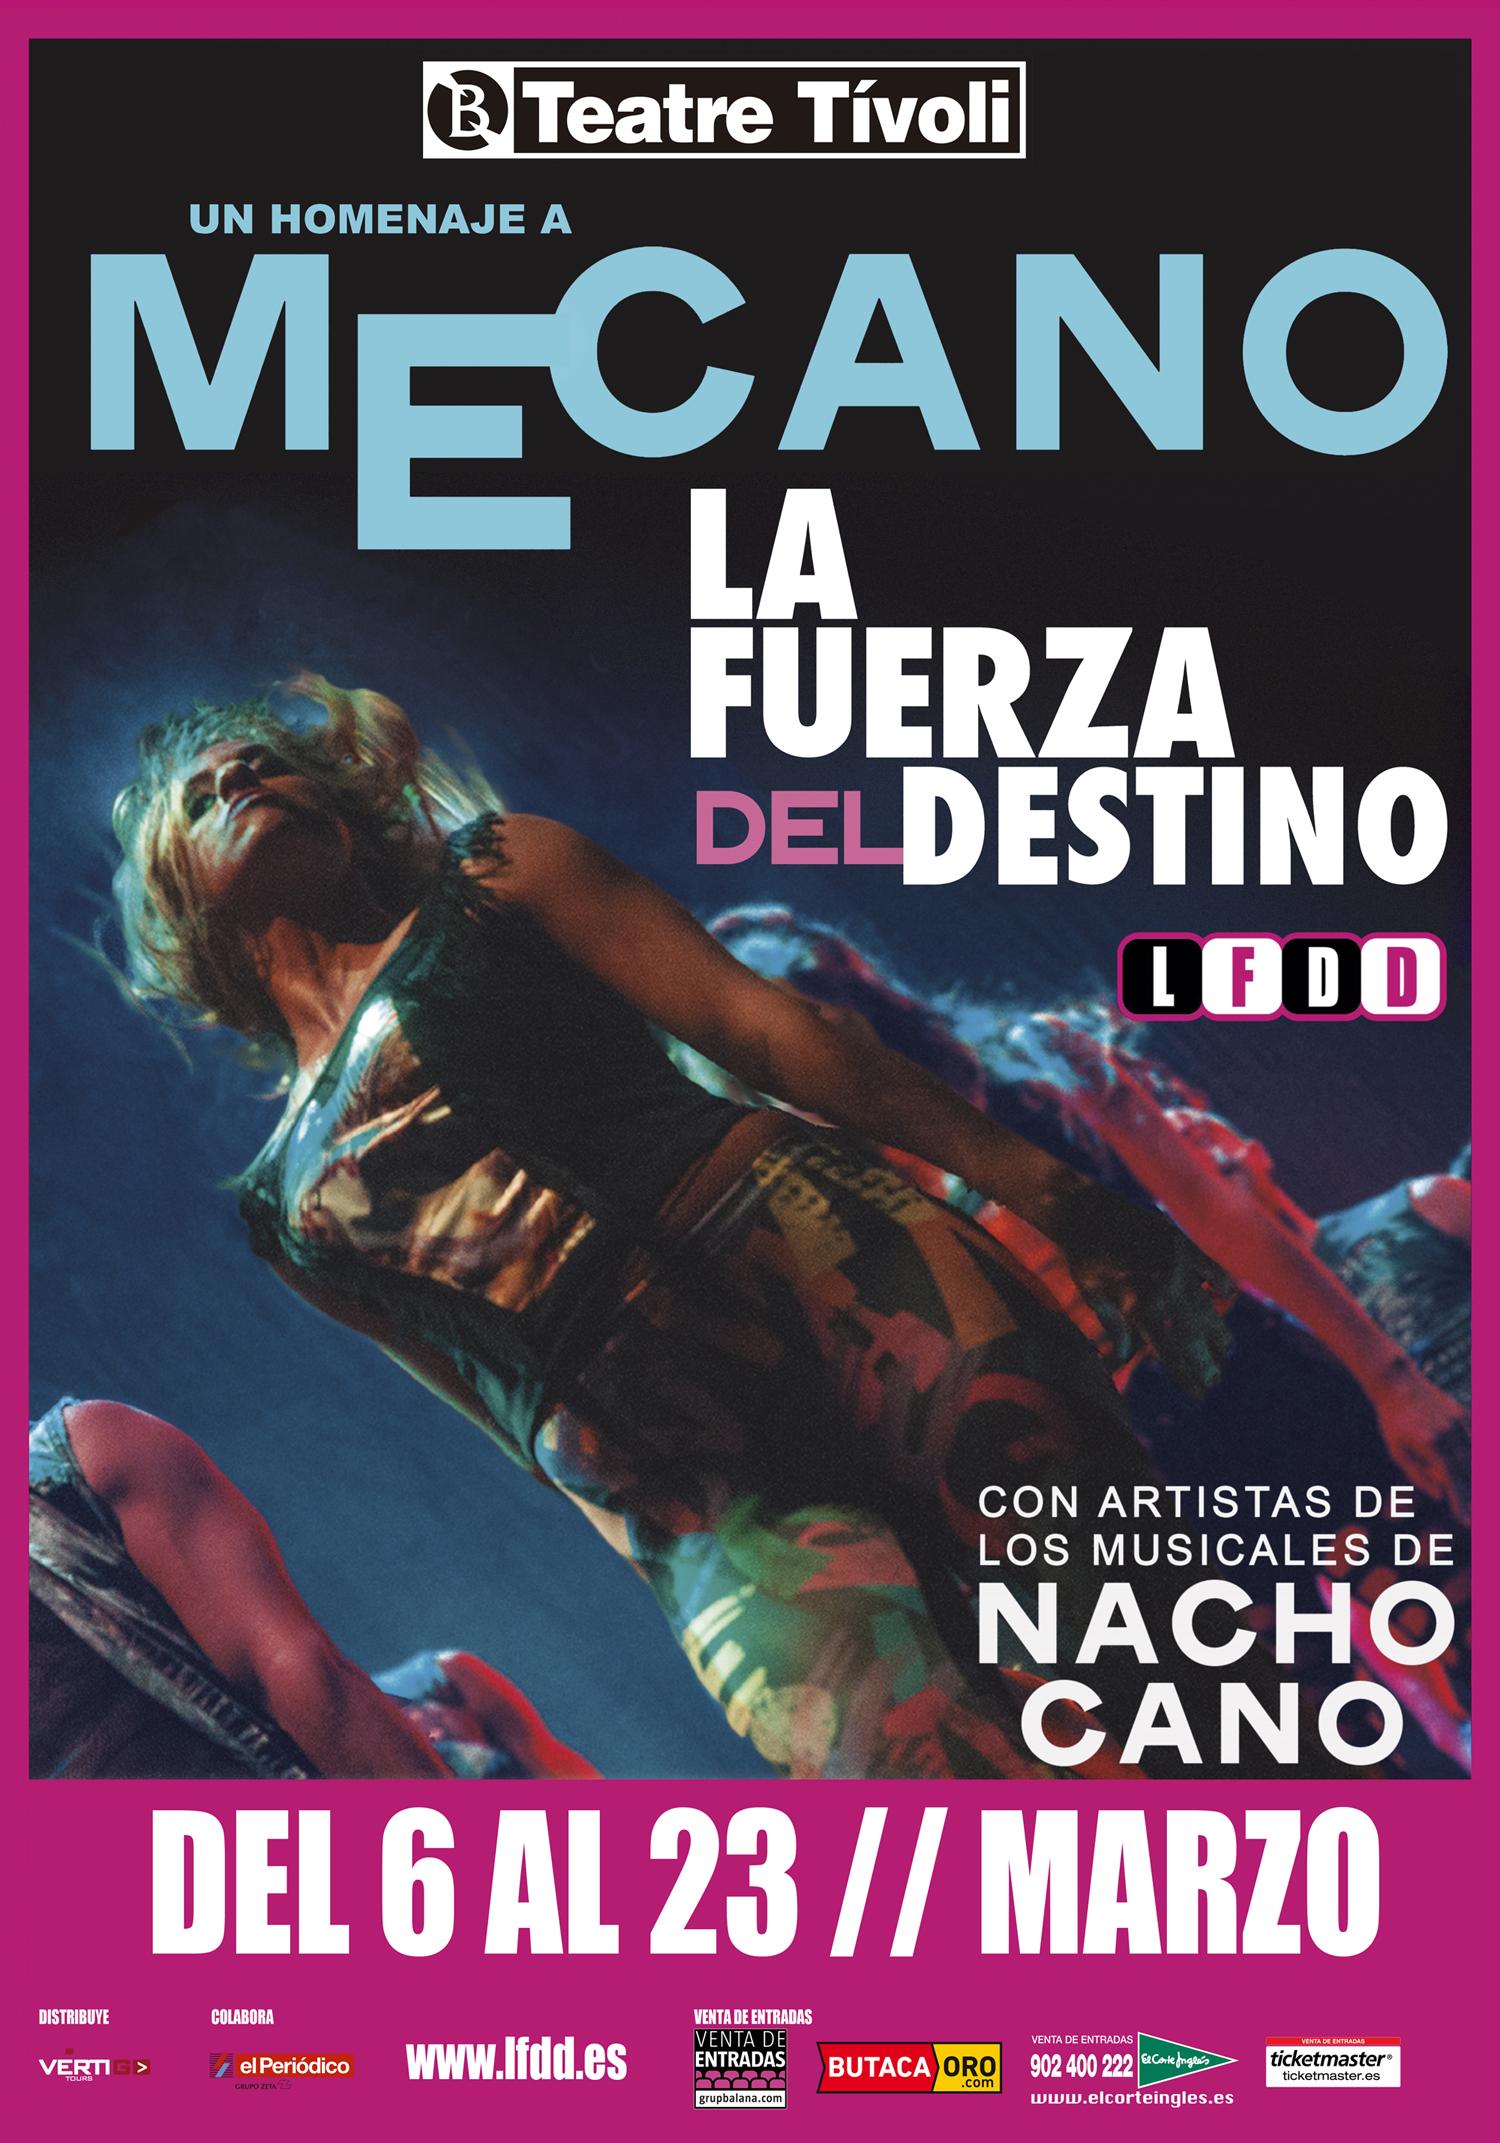 fuerza-del-destino-mecano-tivoli-teatro-barcelona.jpg